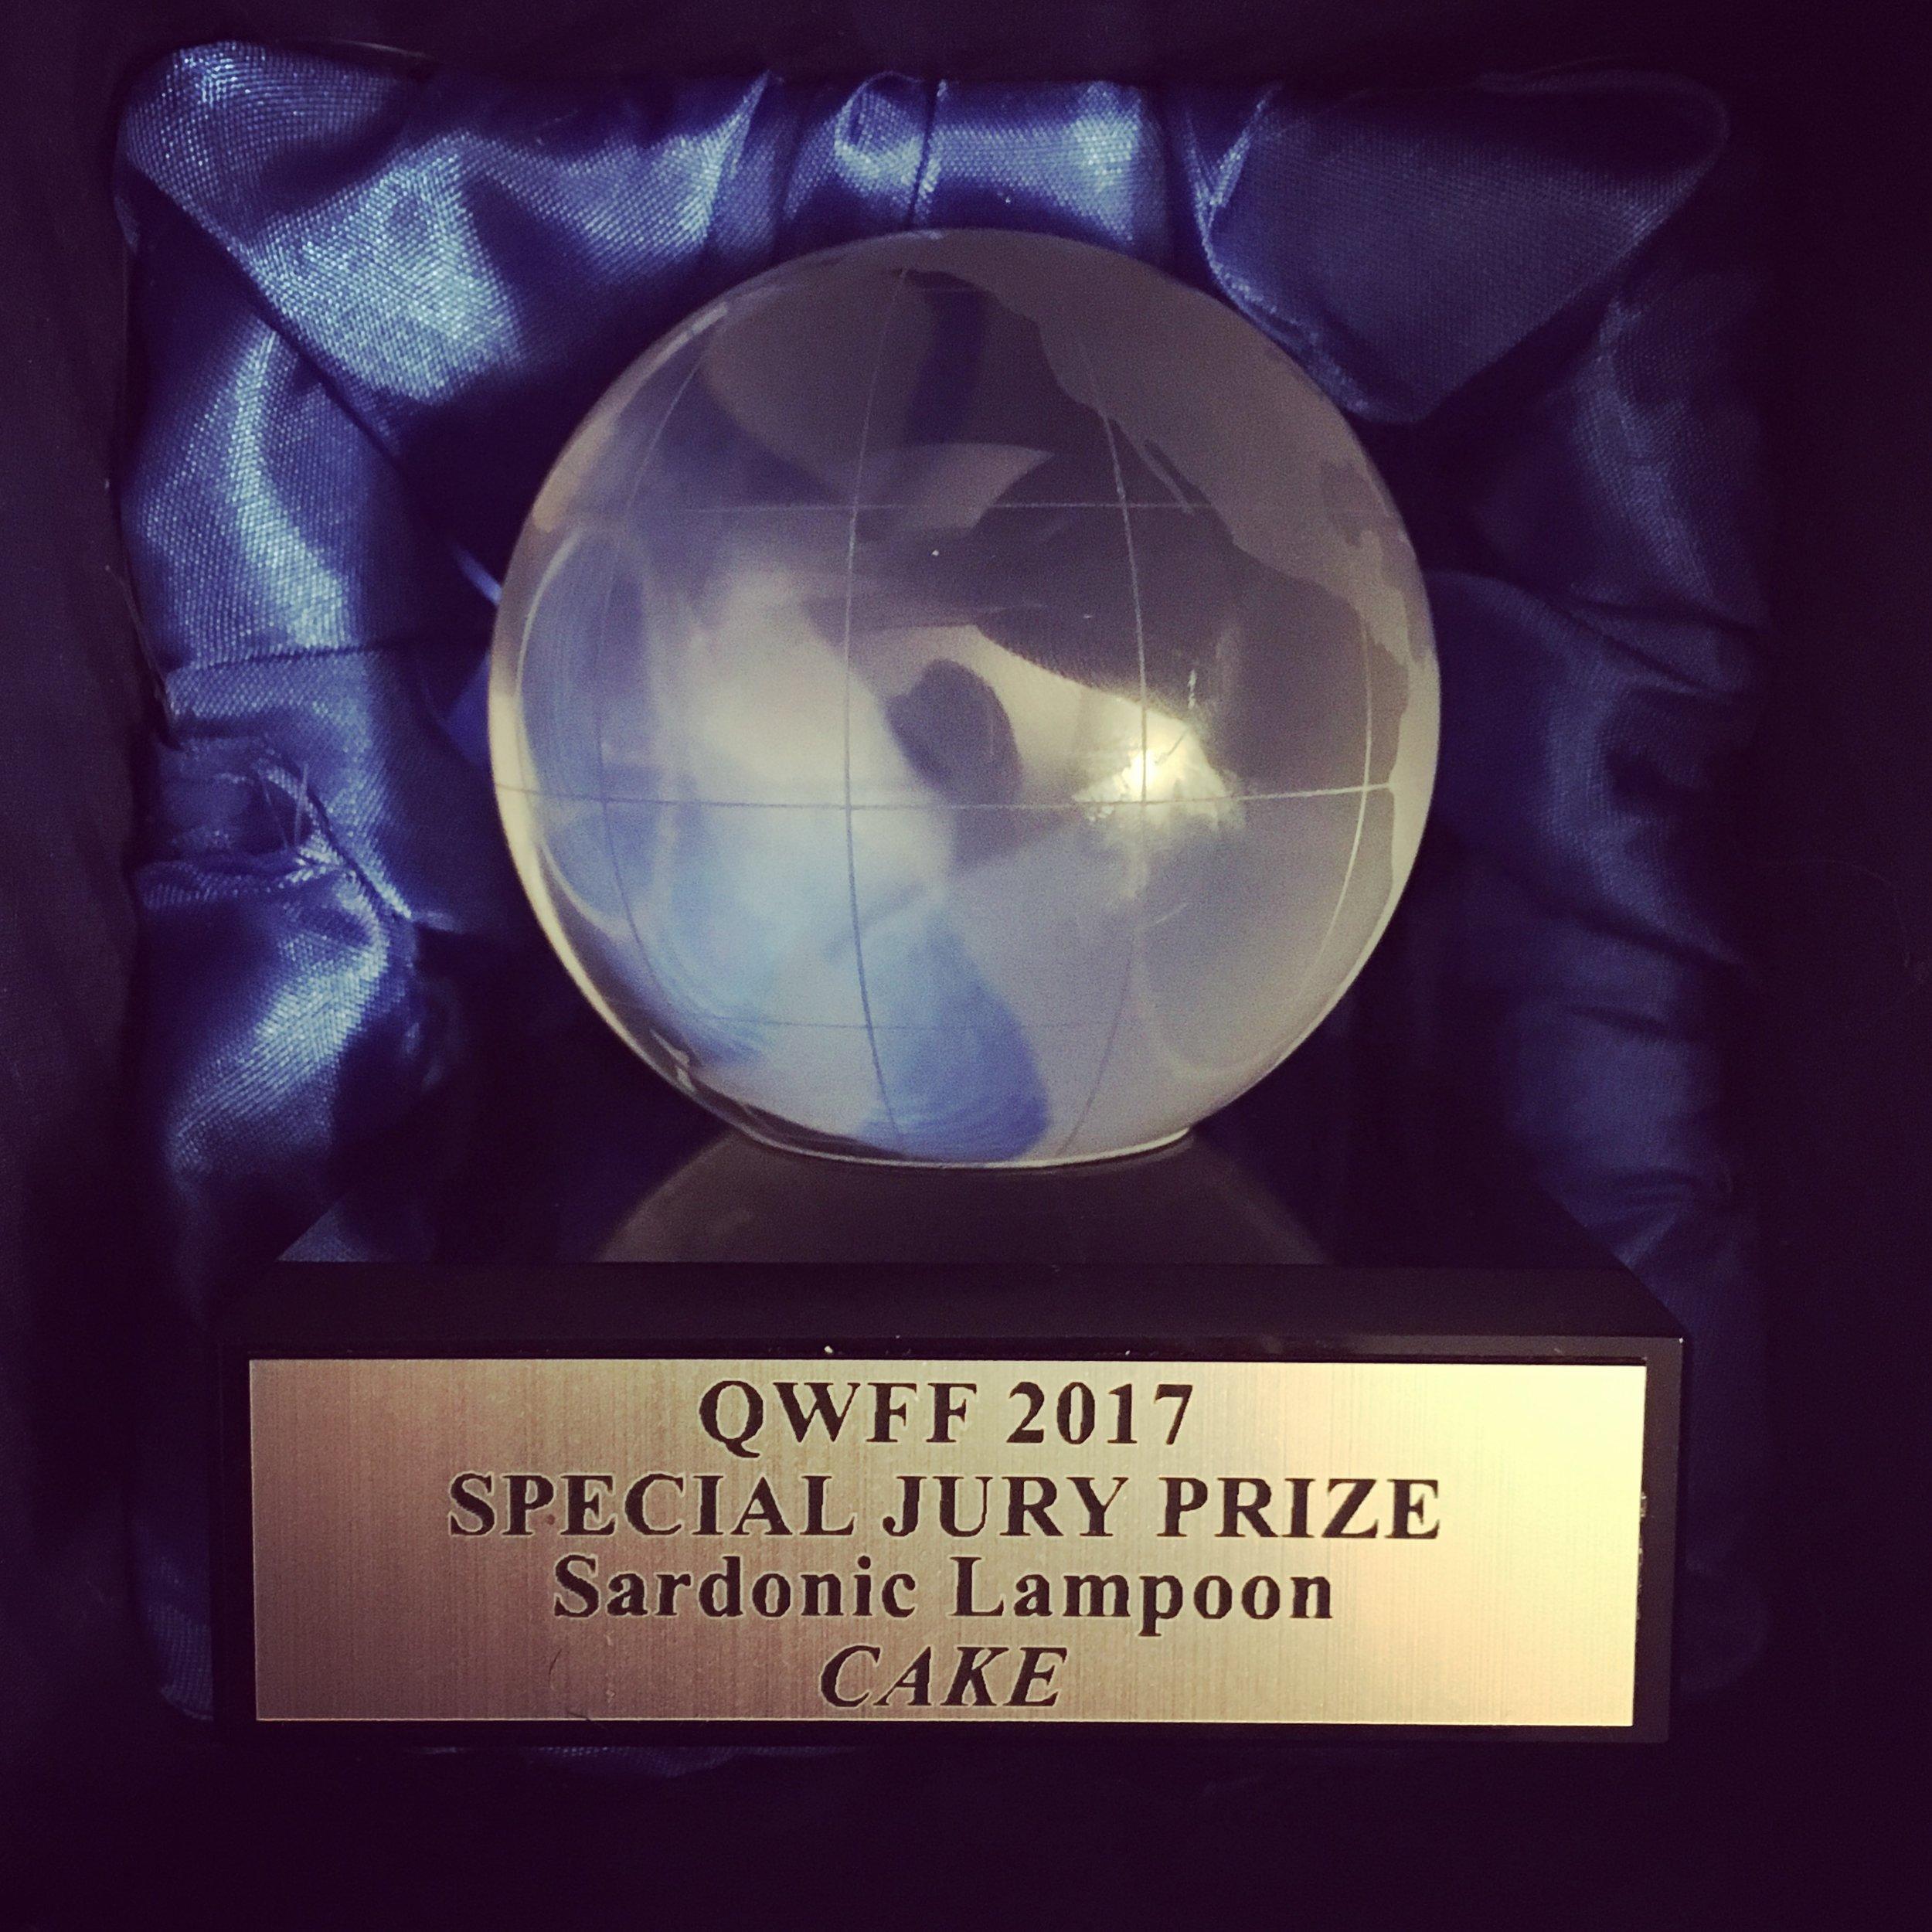 Special Jury Prize for Sardonic Lampoon